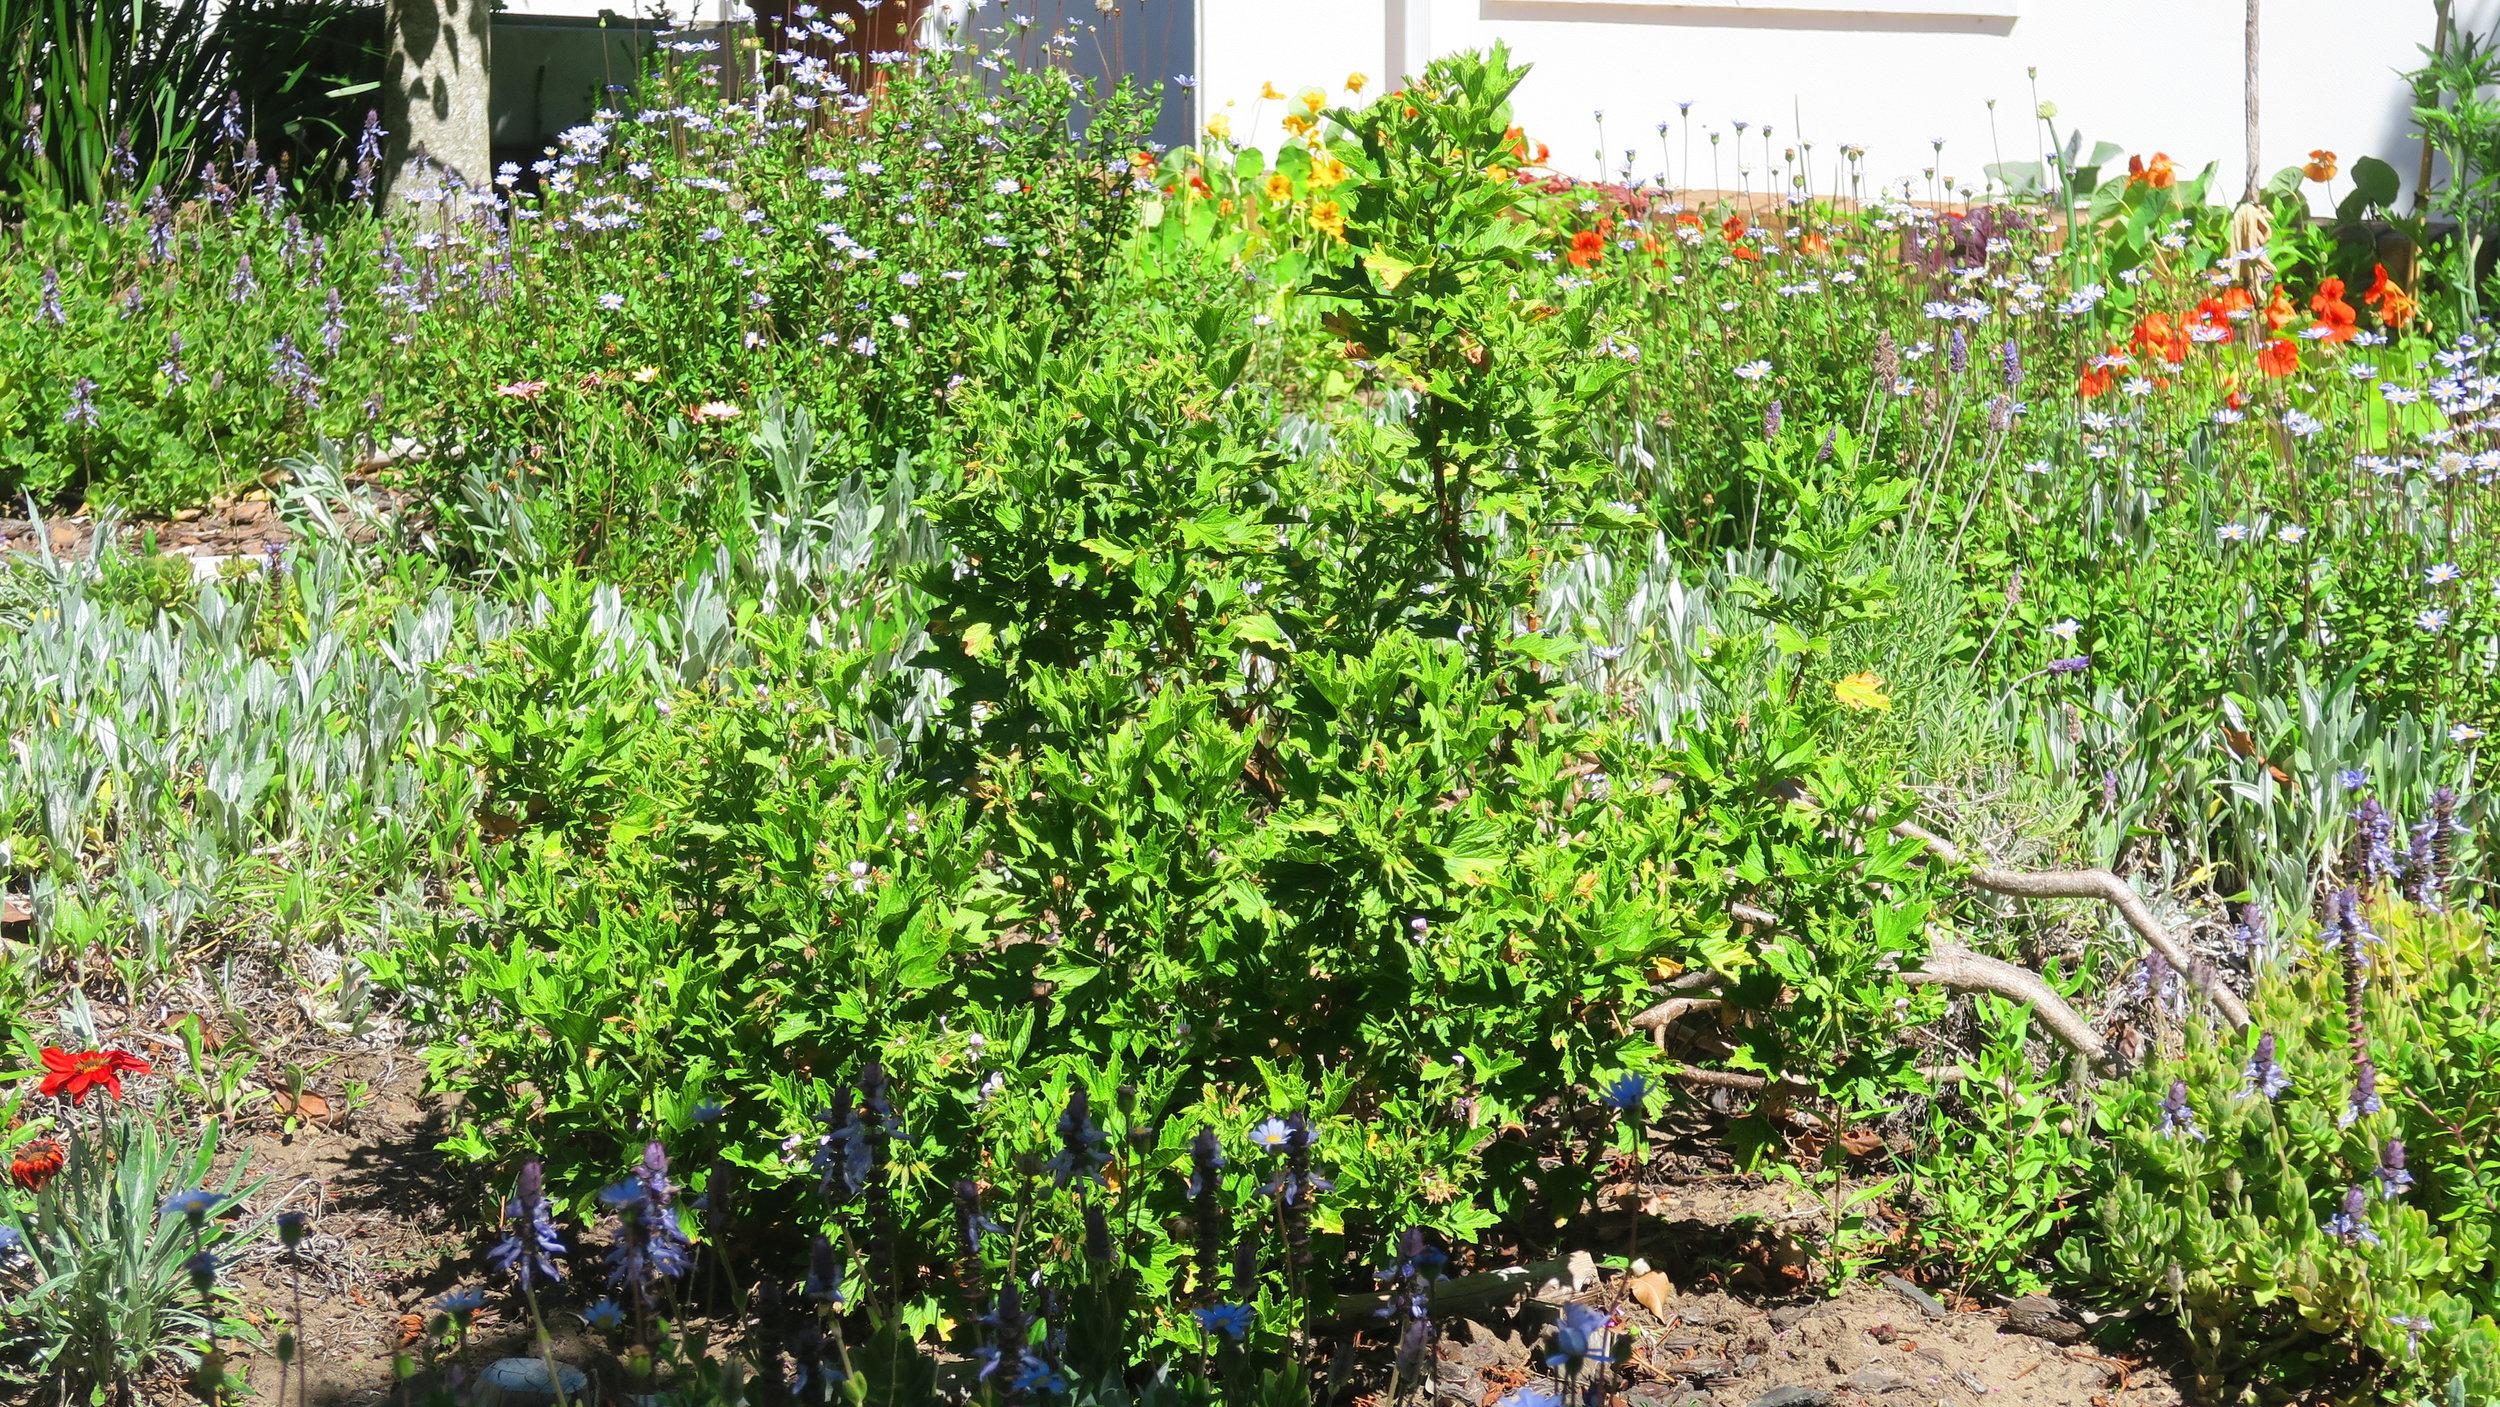 My garden on acid. Uric acid.